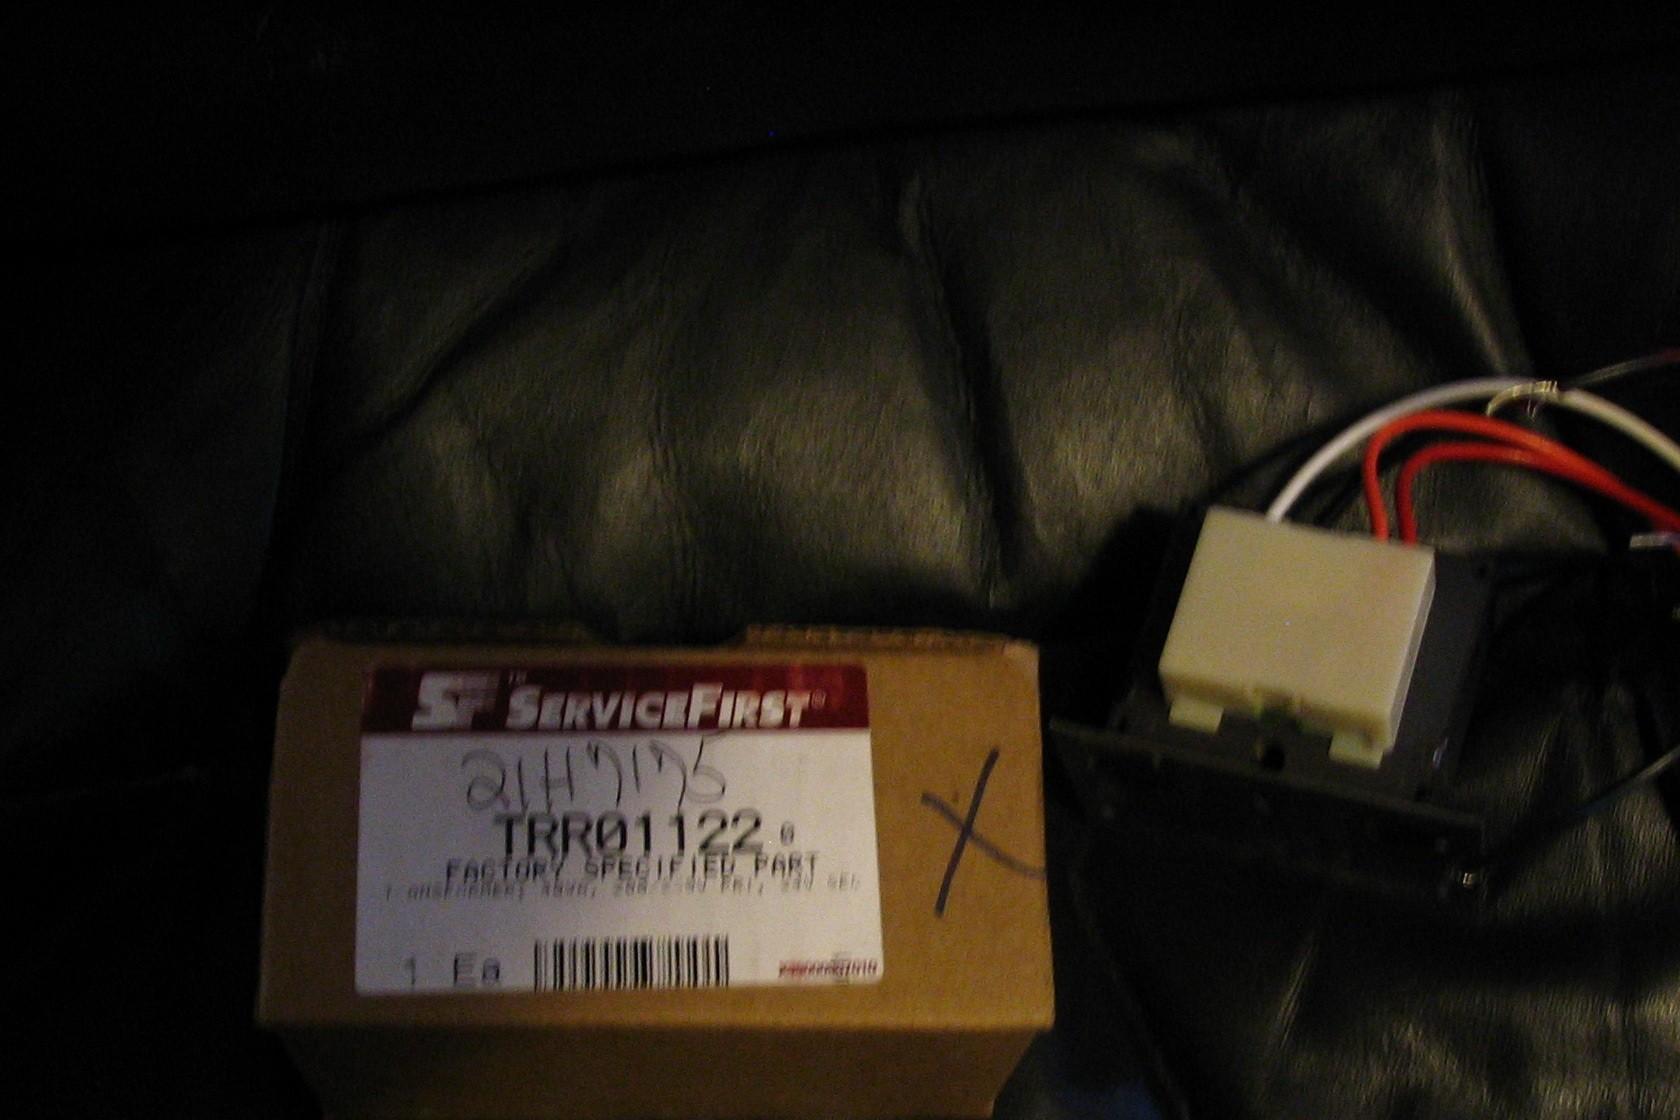 American Standard Trane TRR 01122 transformer old part TRR01322